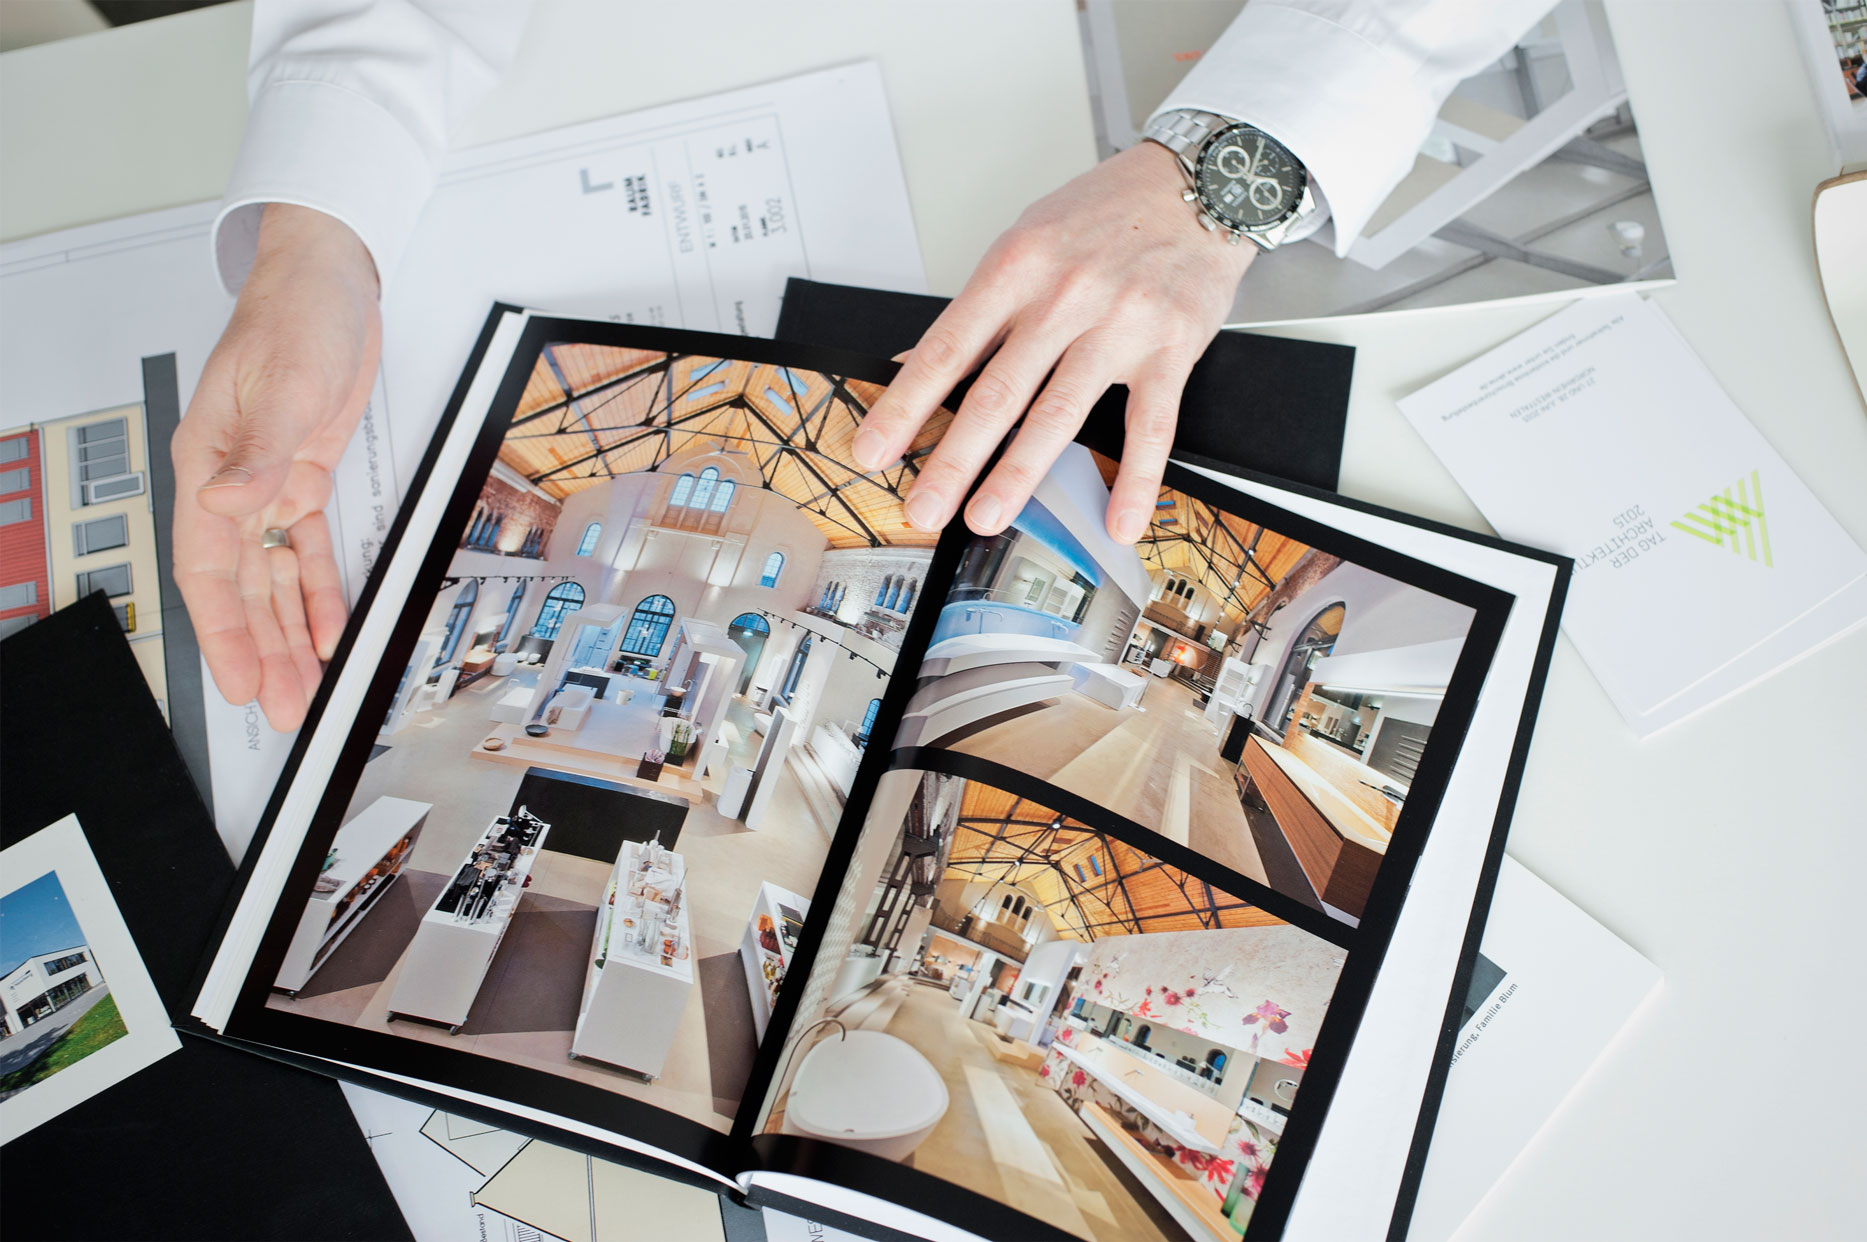 Kreative Symbiose in drei Dimensionen - Studio Meuleneers: Architektur - Design - Interior